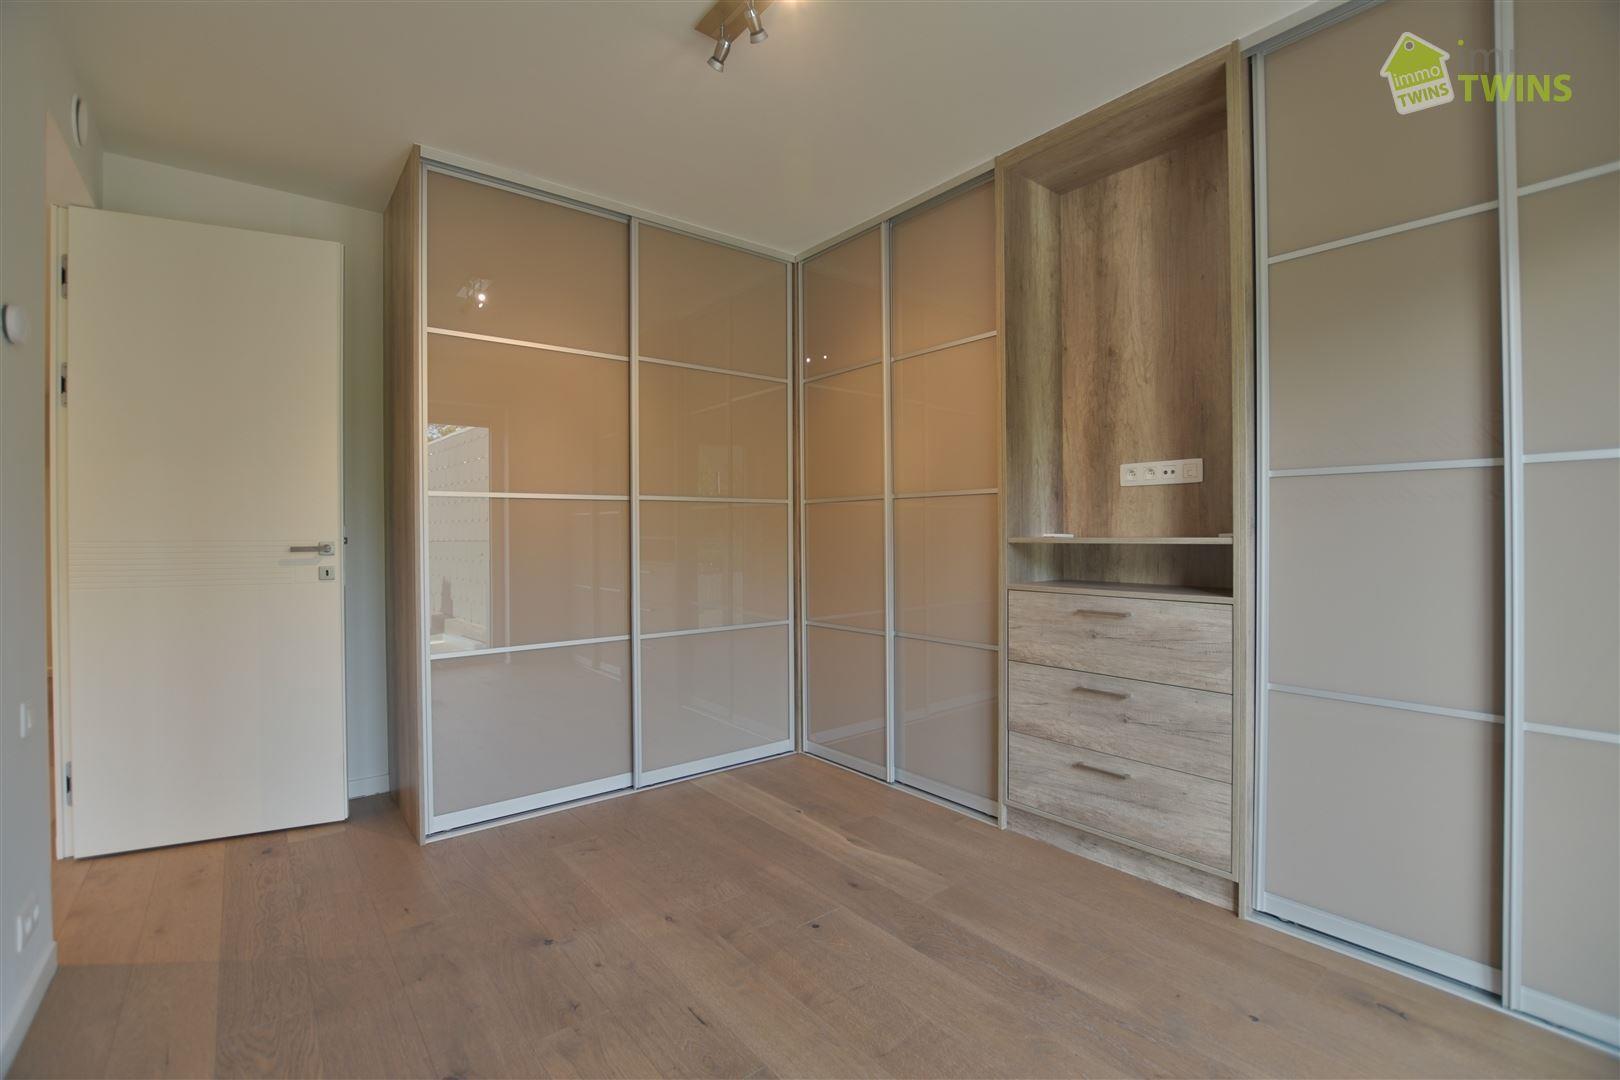 Foto 12 : Appartement te 9200 DENDERMONDE (België) - Prijs € 1.100